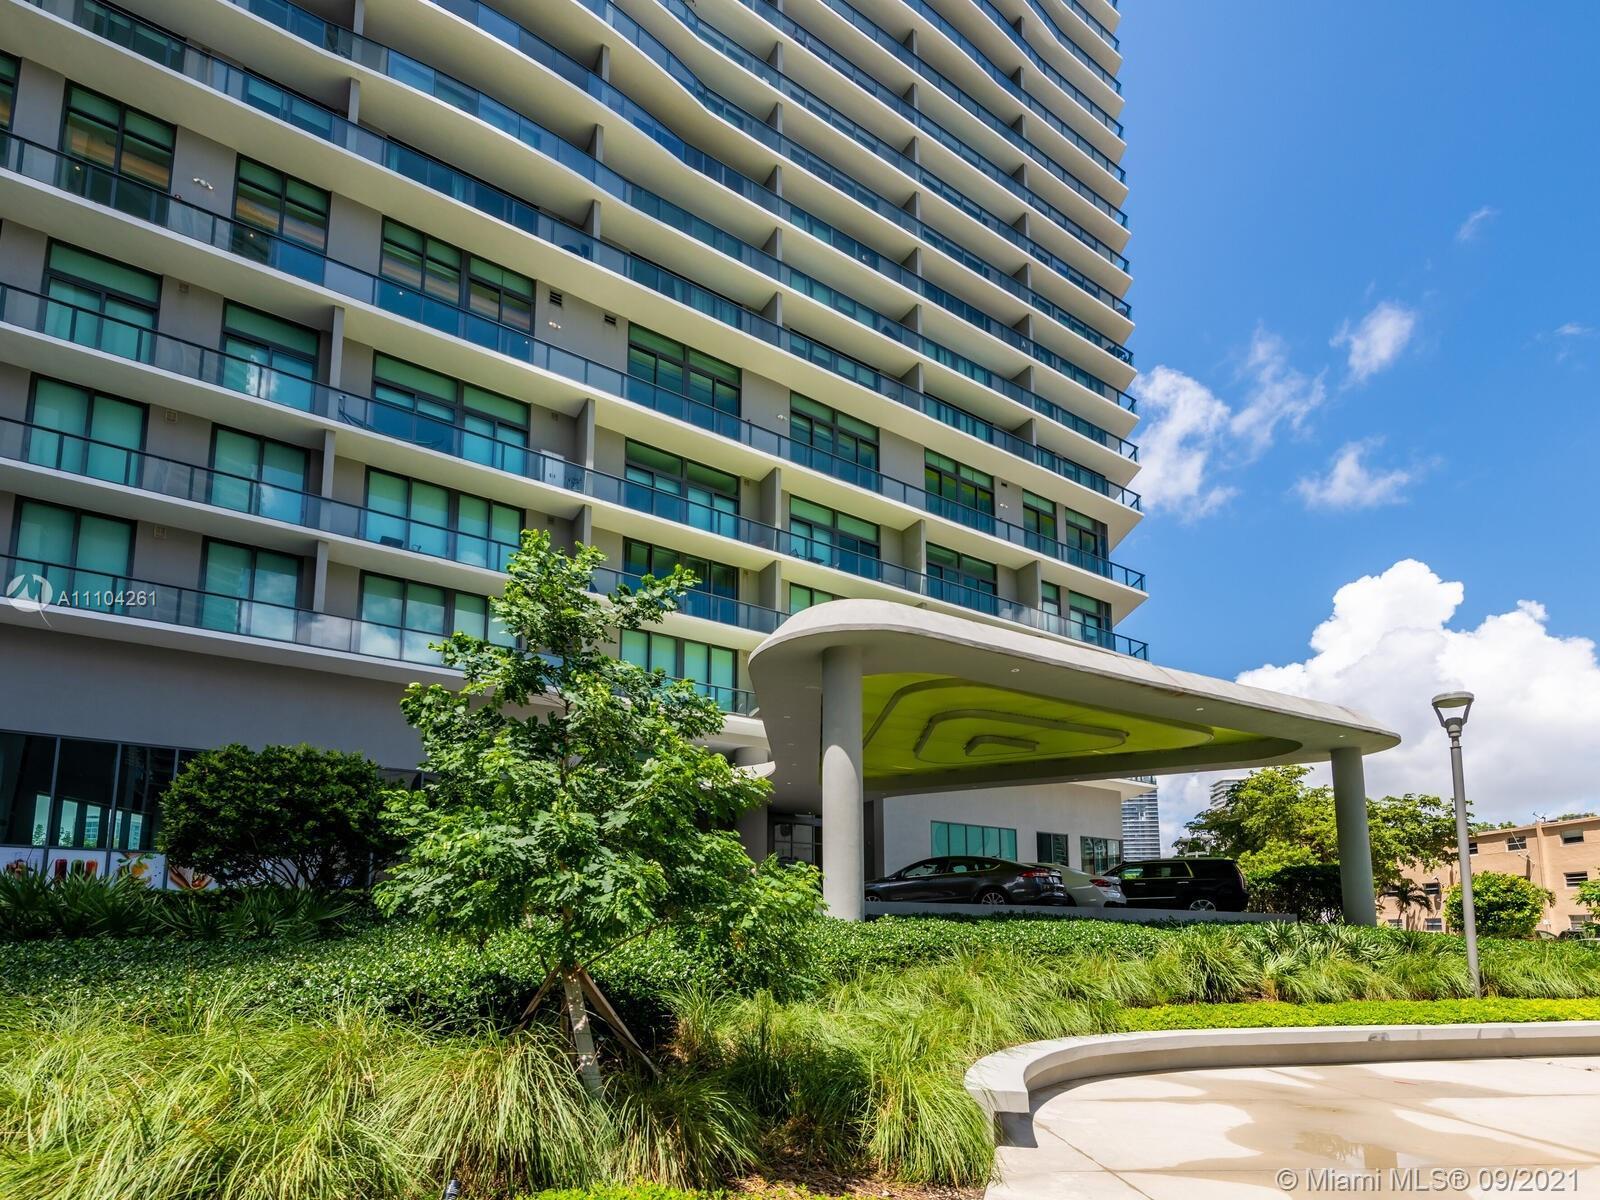 Paraiso Bayviews #3701 - 501 NE 31st St #3701, Miami, FL 33137